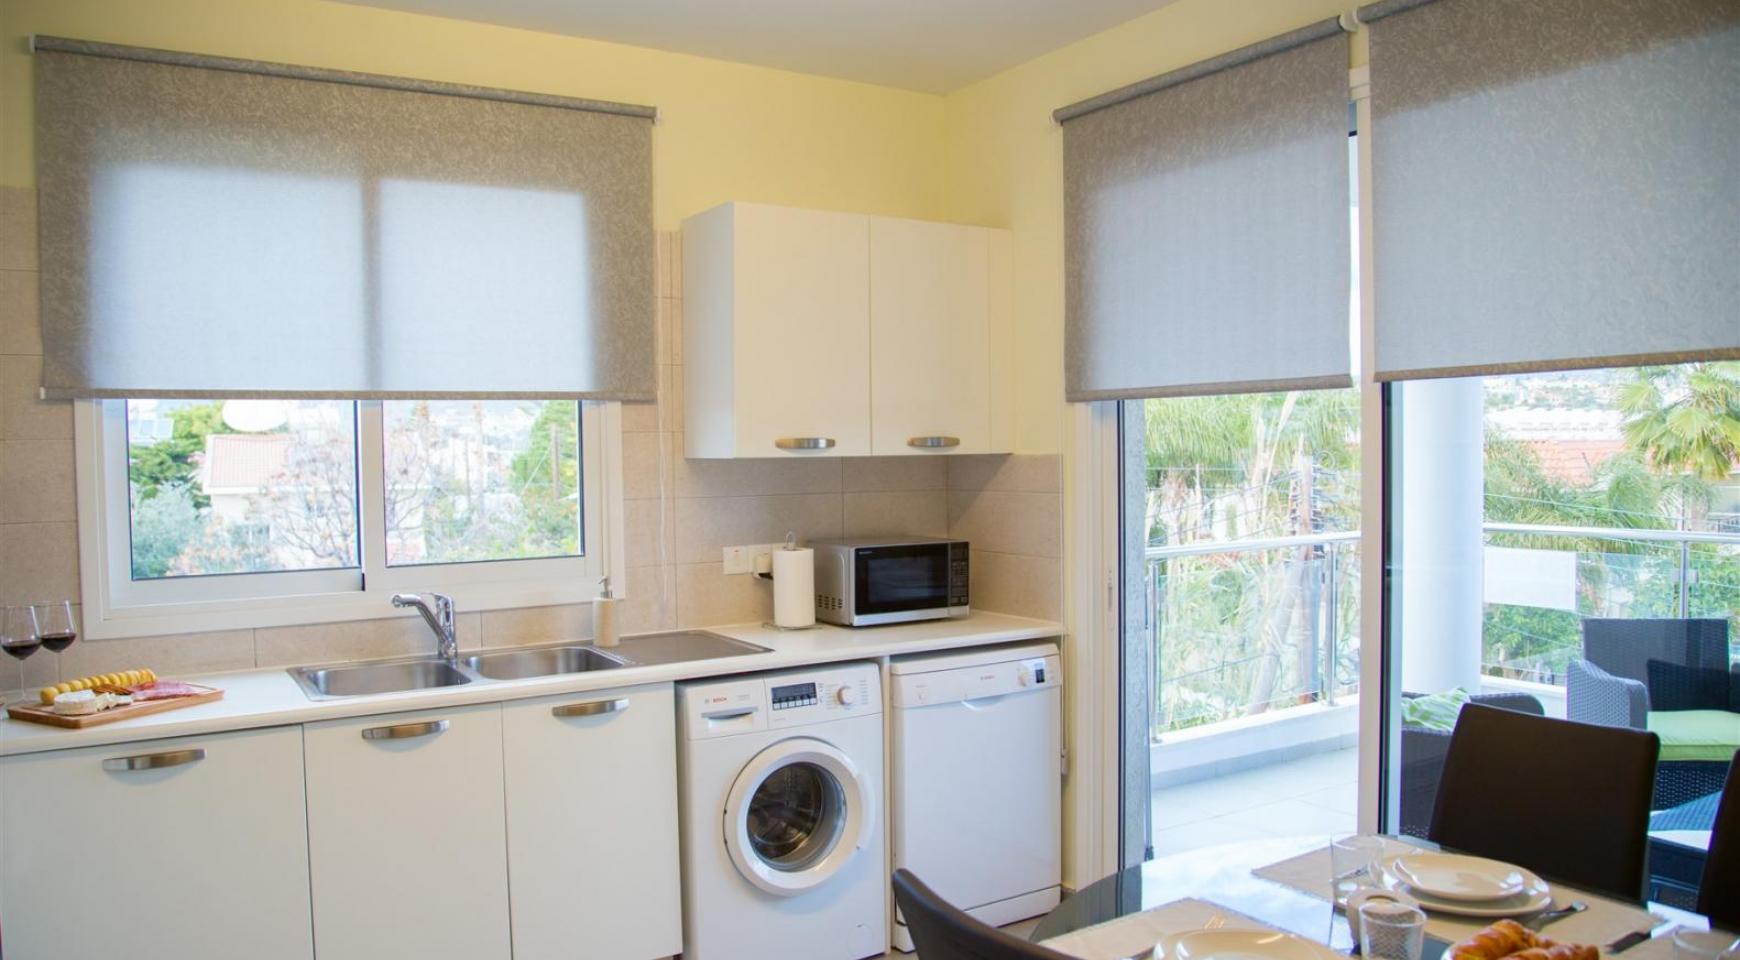 Luxury 2 Bedroom Apartment Christina 301 in the Tourist Area - 17